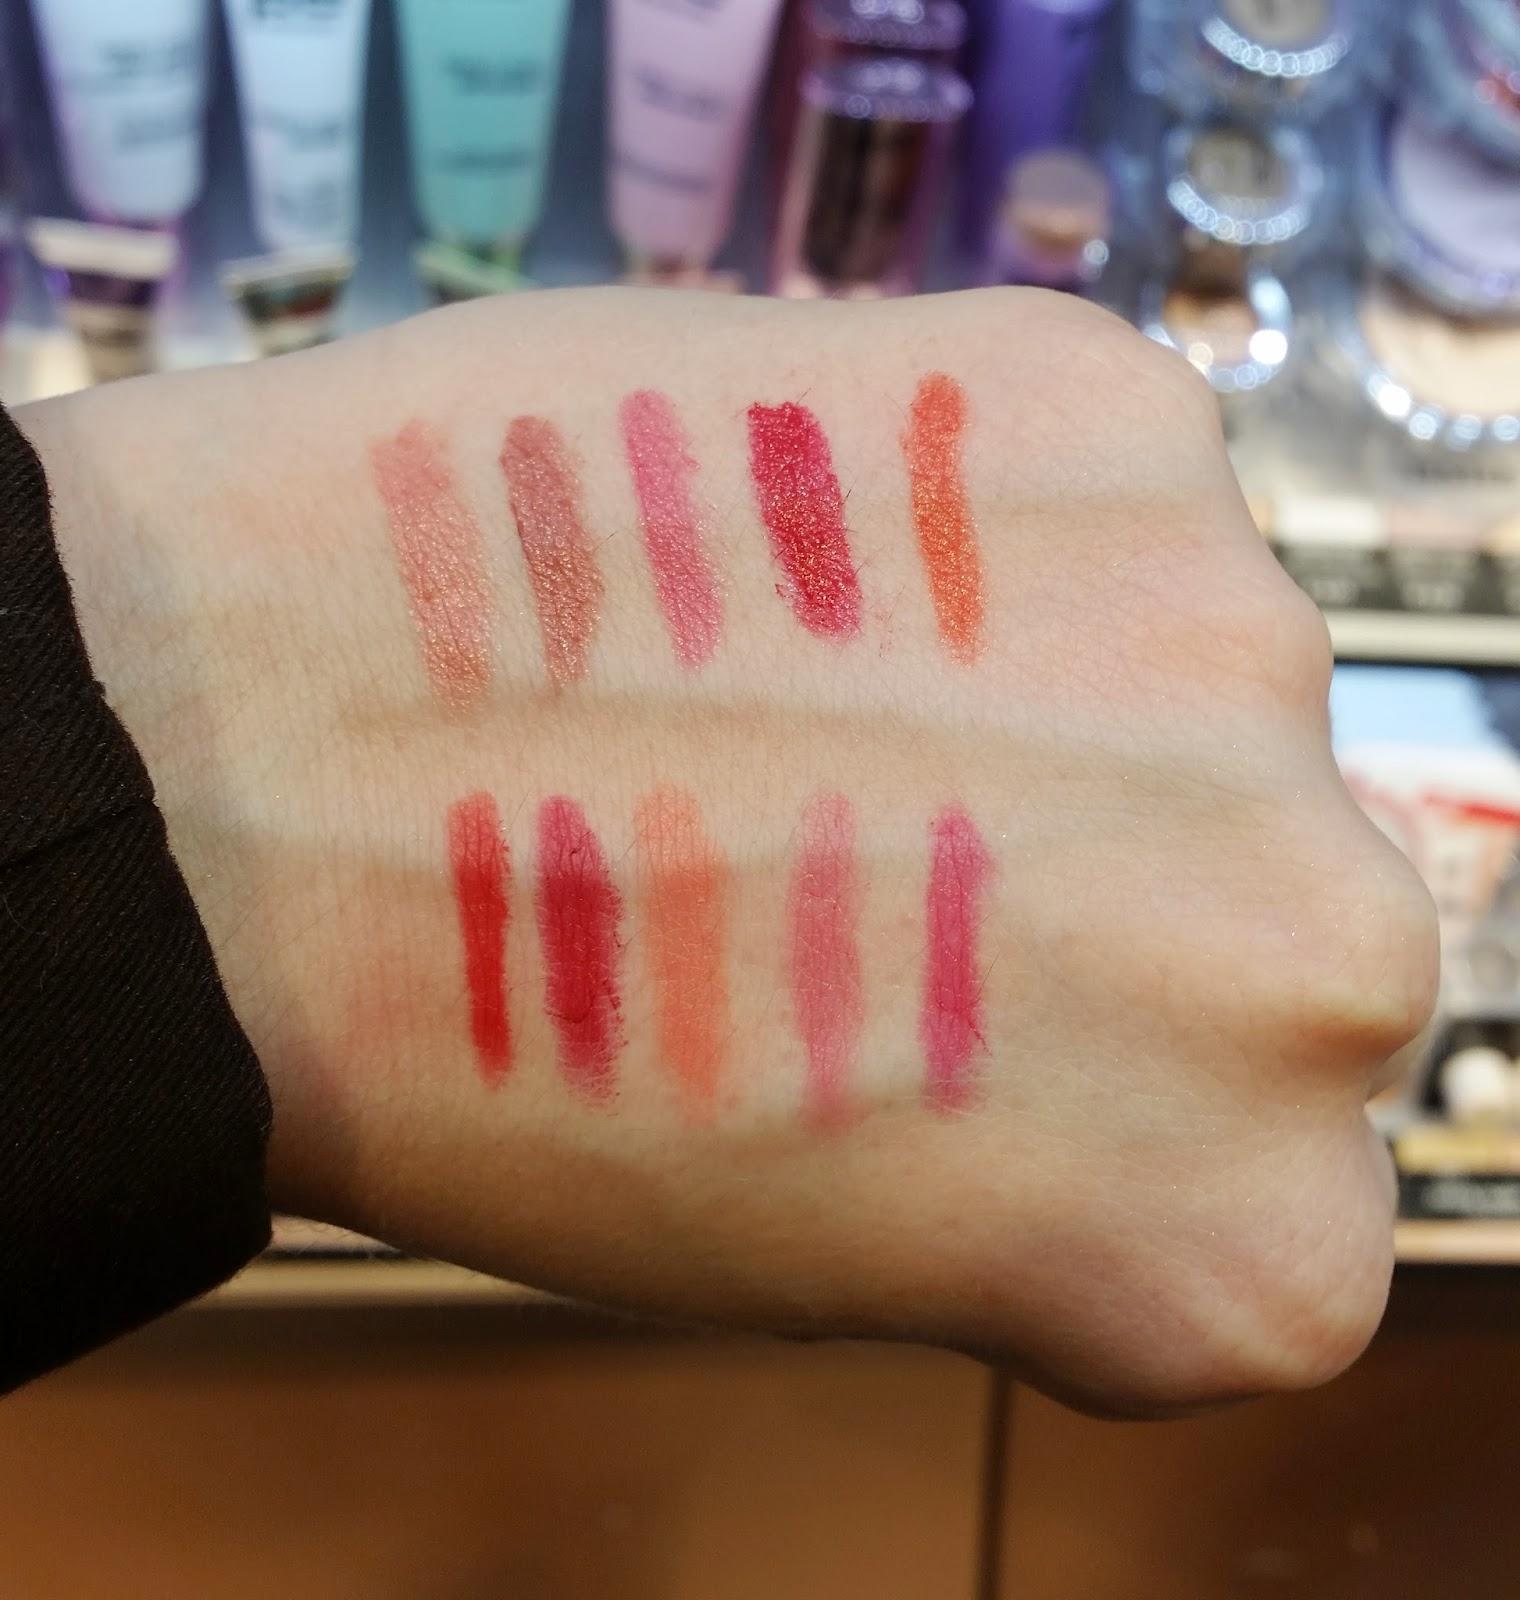 long-lasting matte maxi lipstick/ long-lasting shine maxi lipstick, Swatch